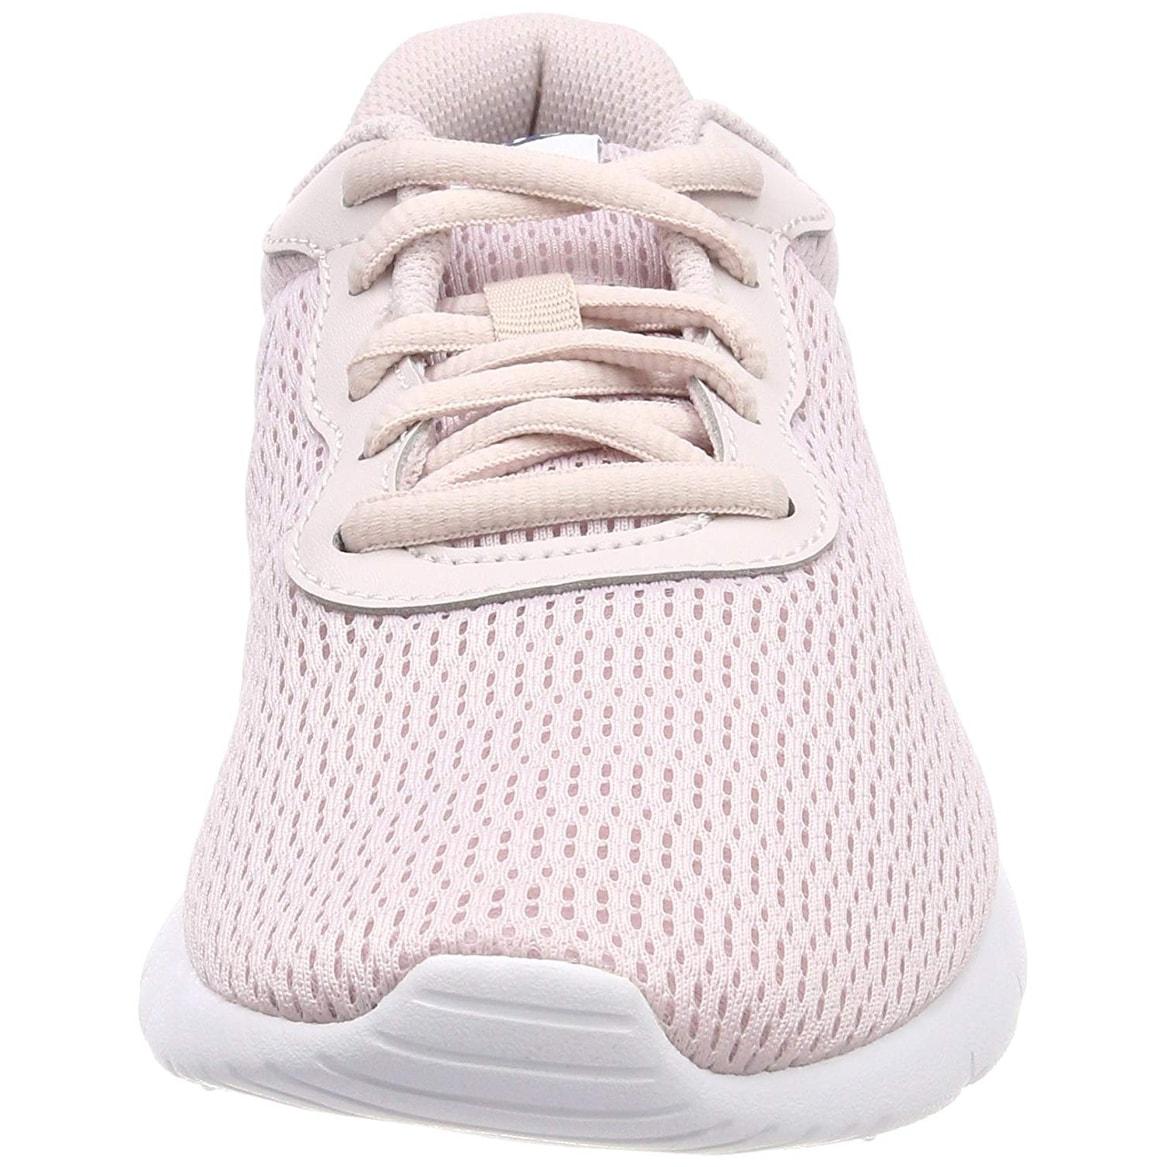 8c4bd7272492 Shop Nike 818384-600  Girl s Tanjun Barely Rose Navy White Sneaker (6 M Us  Big Kid) - Free Shipping Today - Overstock - 25593314